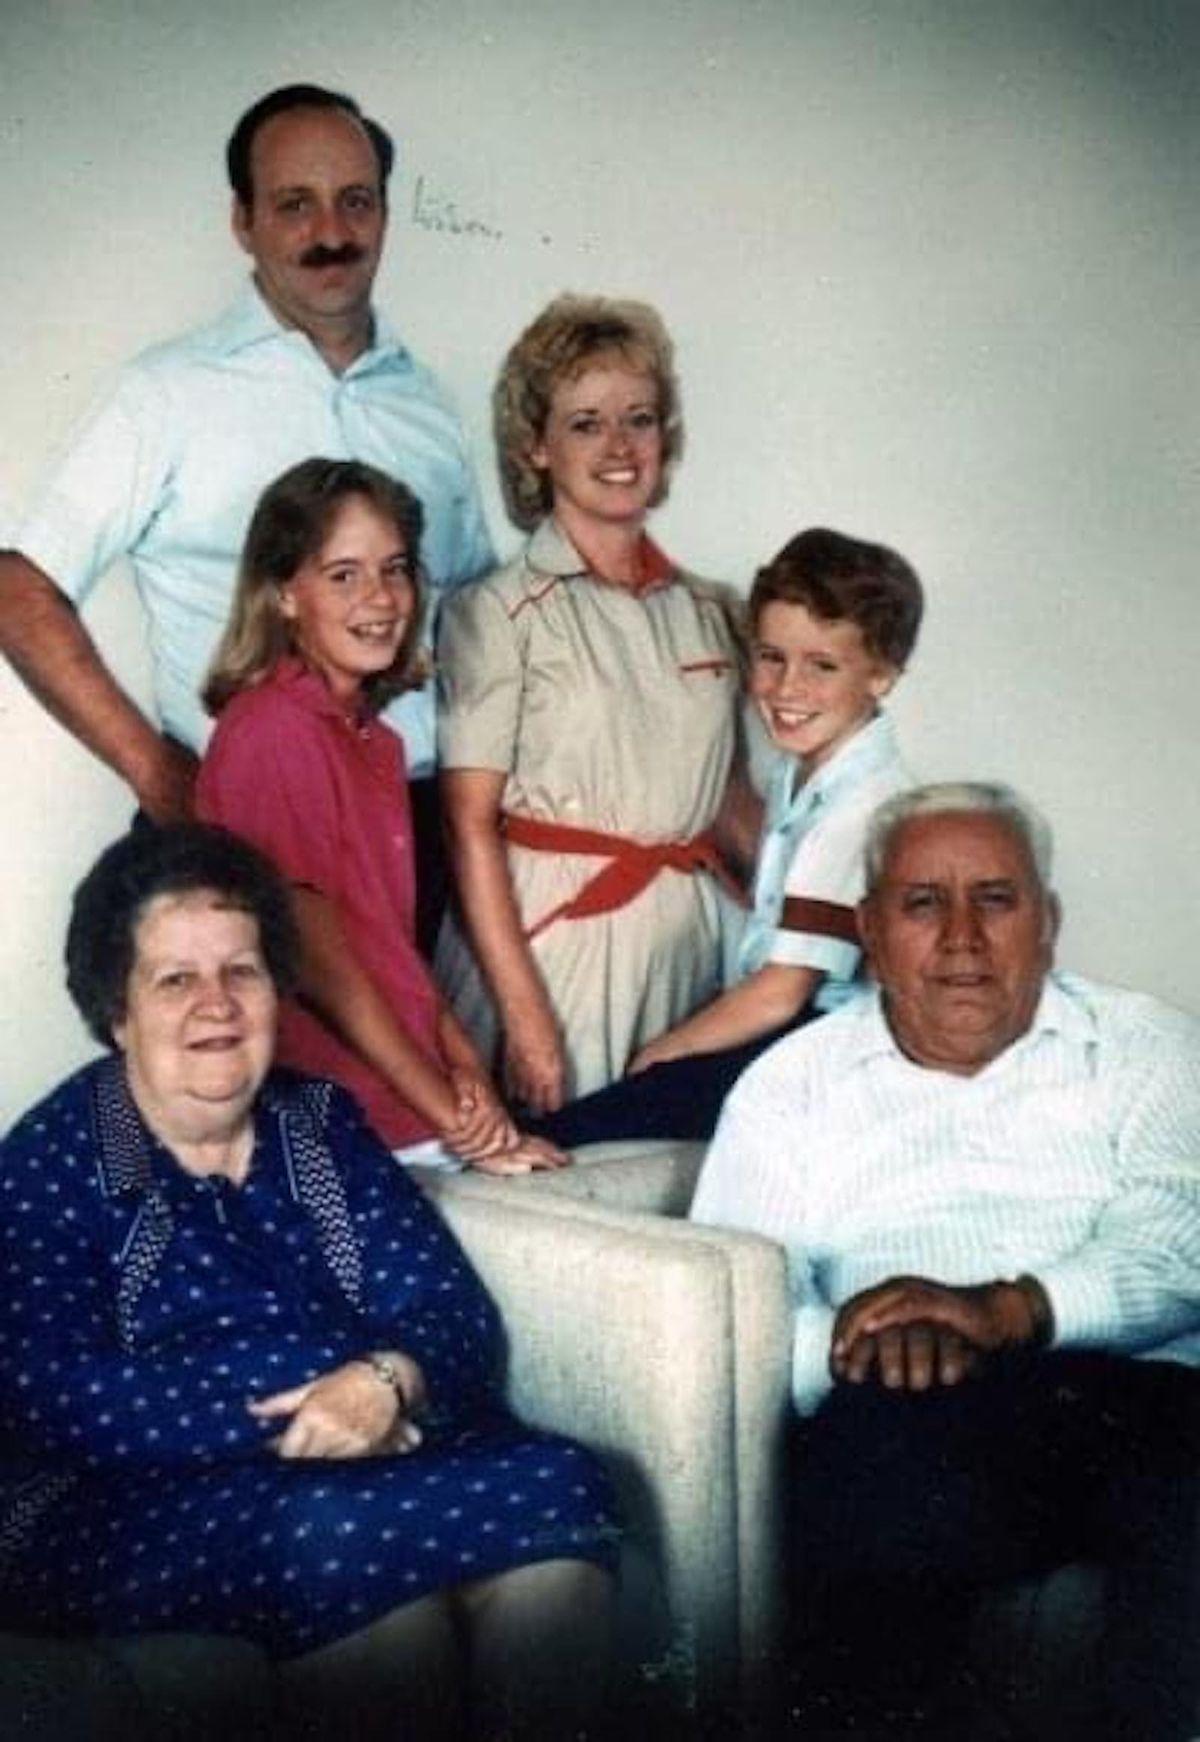 A 1985 family photo with Eileen Coglianese, her husband fire Lt. Edmond P. Coglianese, their children Allyson and Matthew and Mr. Coglianese's parents Joseph and Helen.